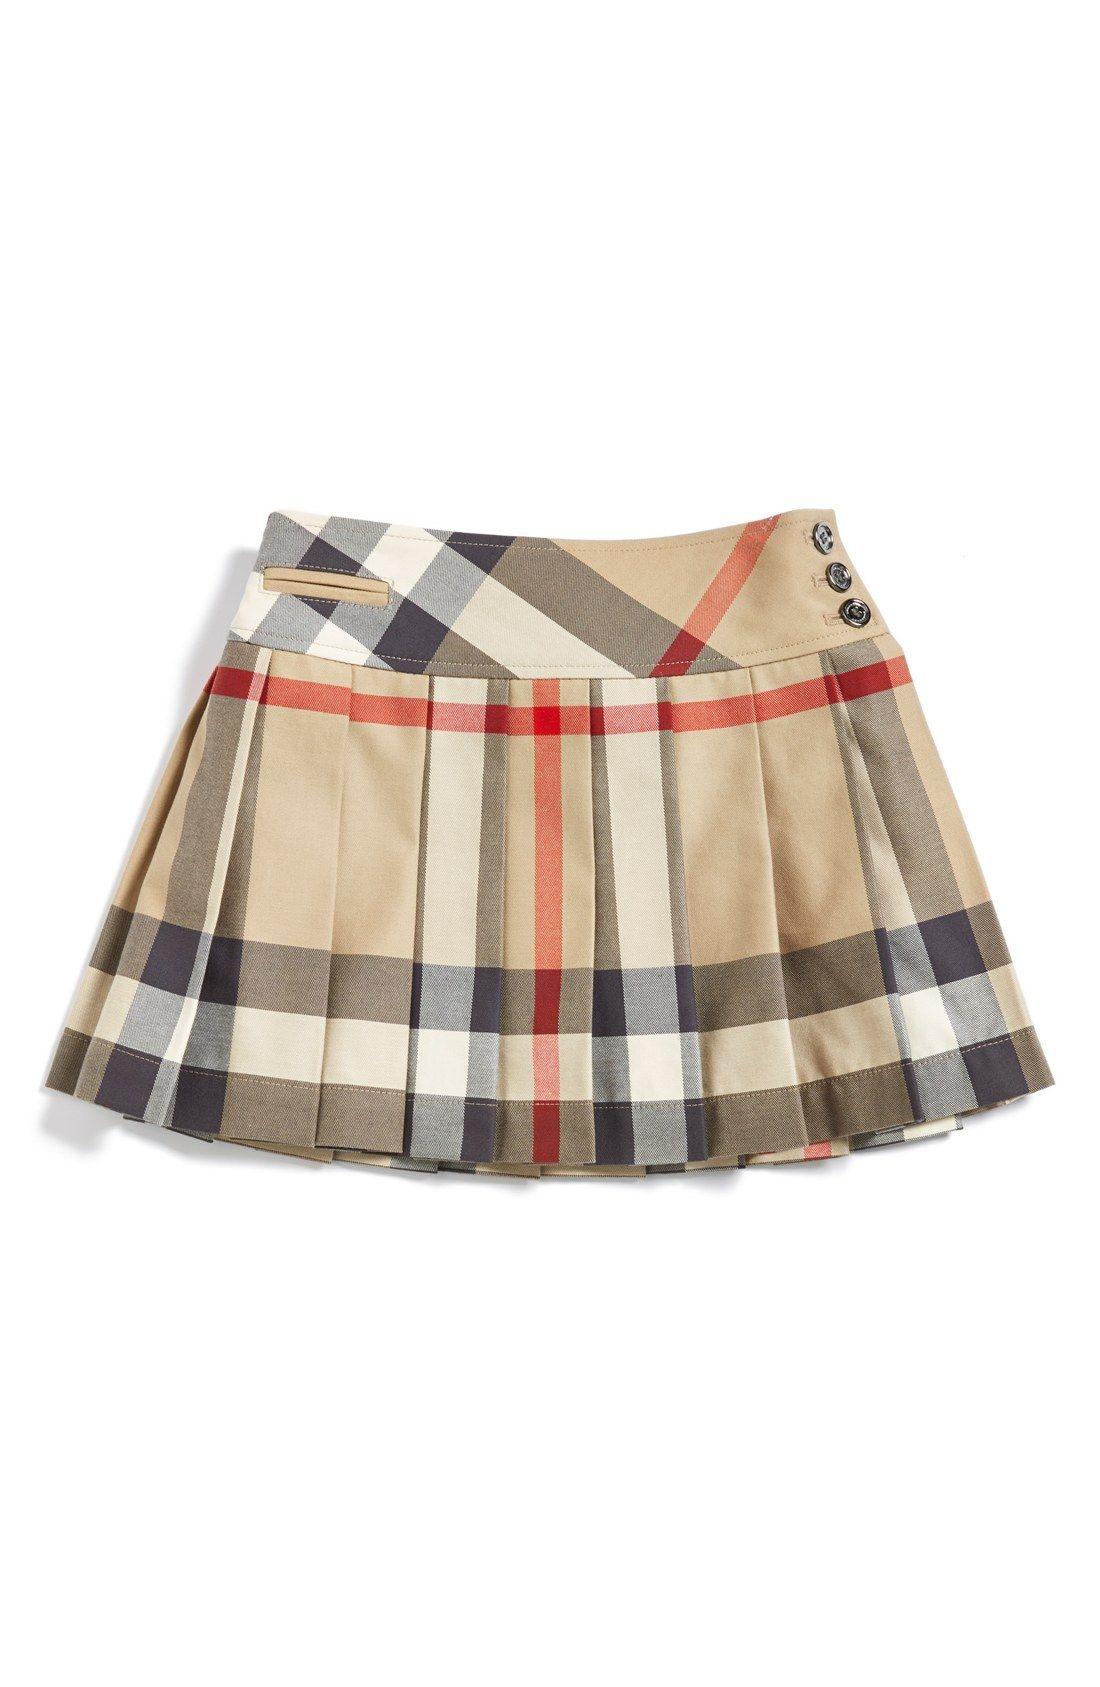 5fc7aba2ffd89 Burberry Check Print Skirt (Little Girls   Big Girls)